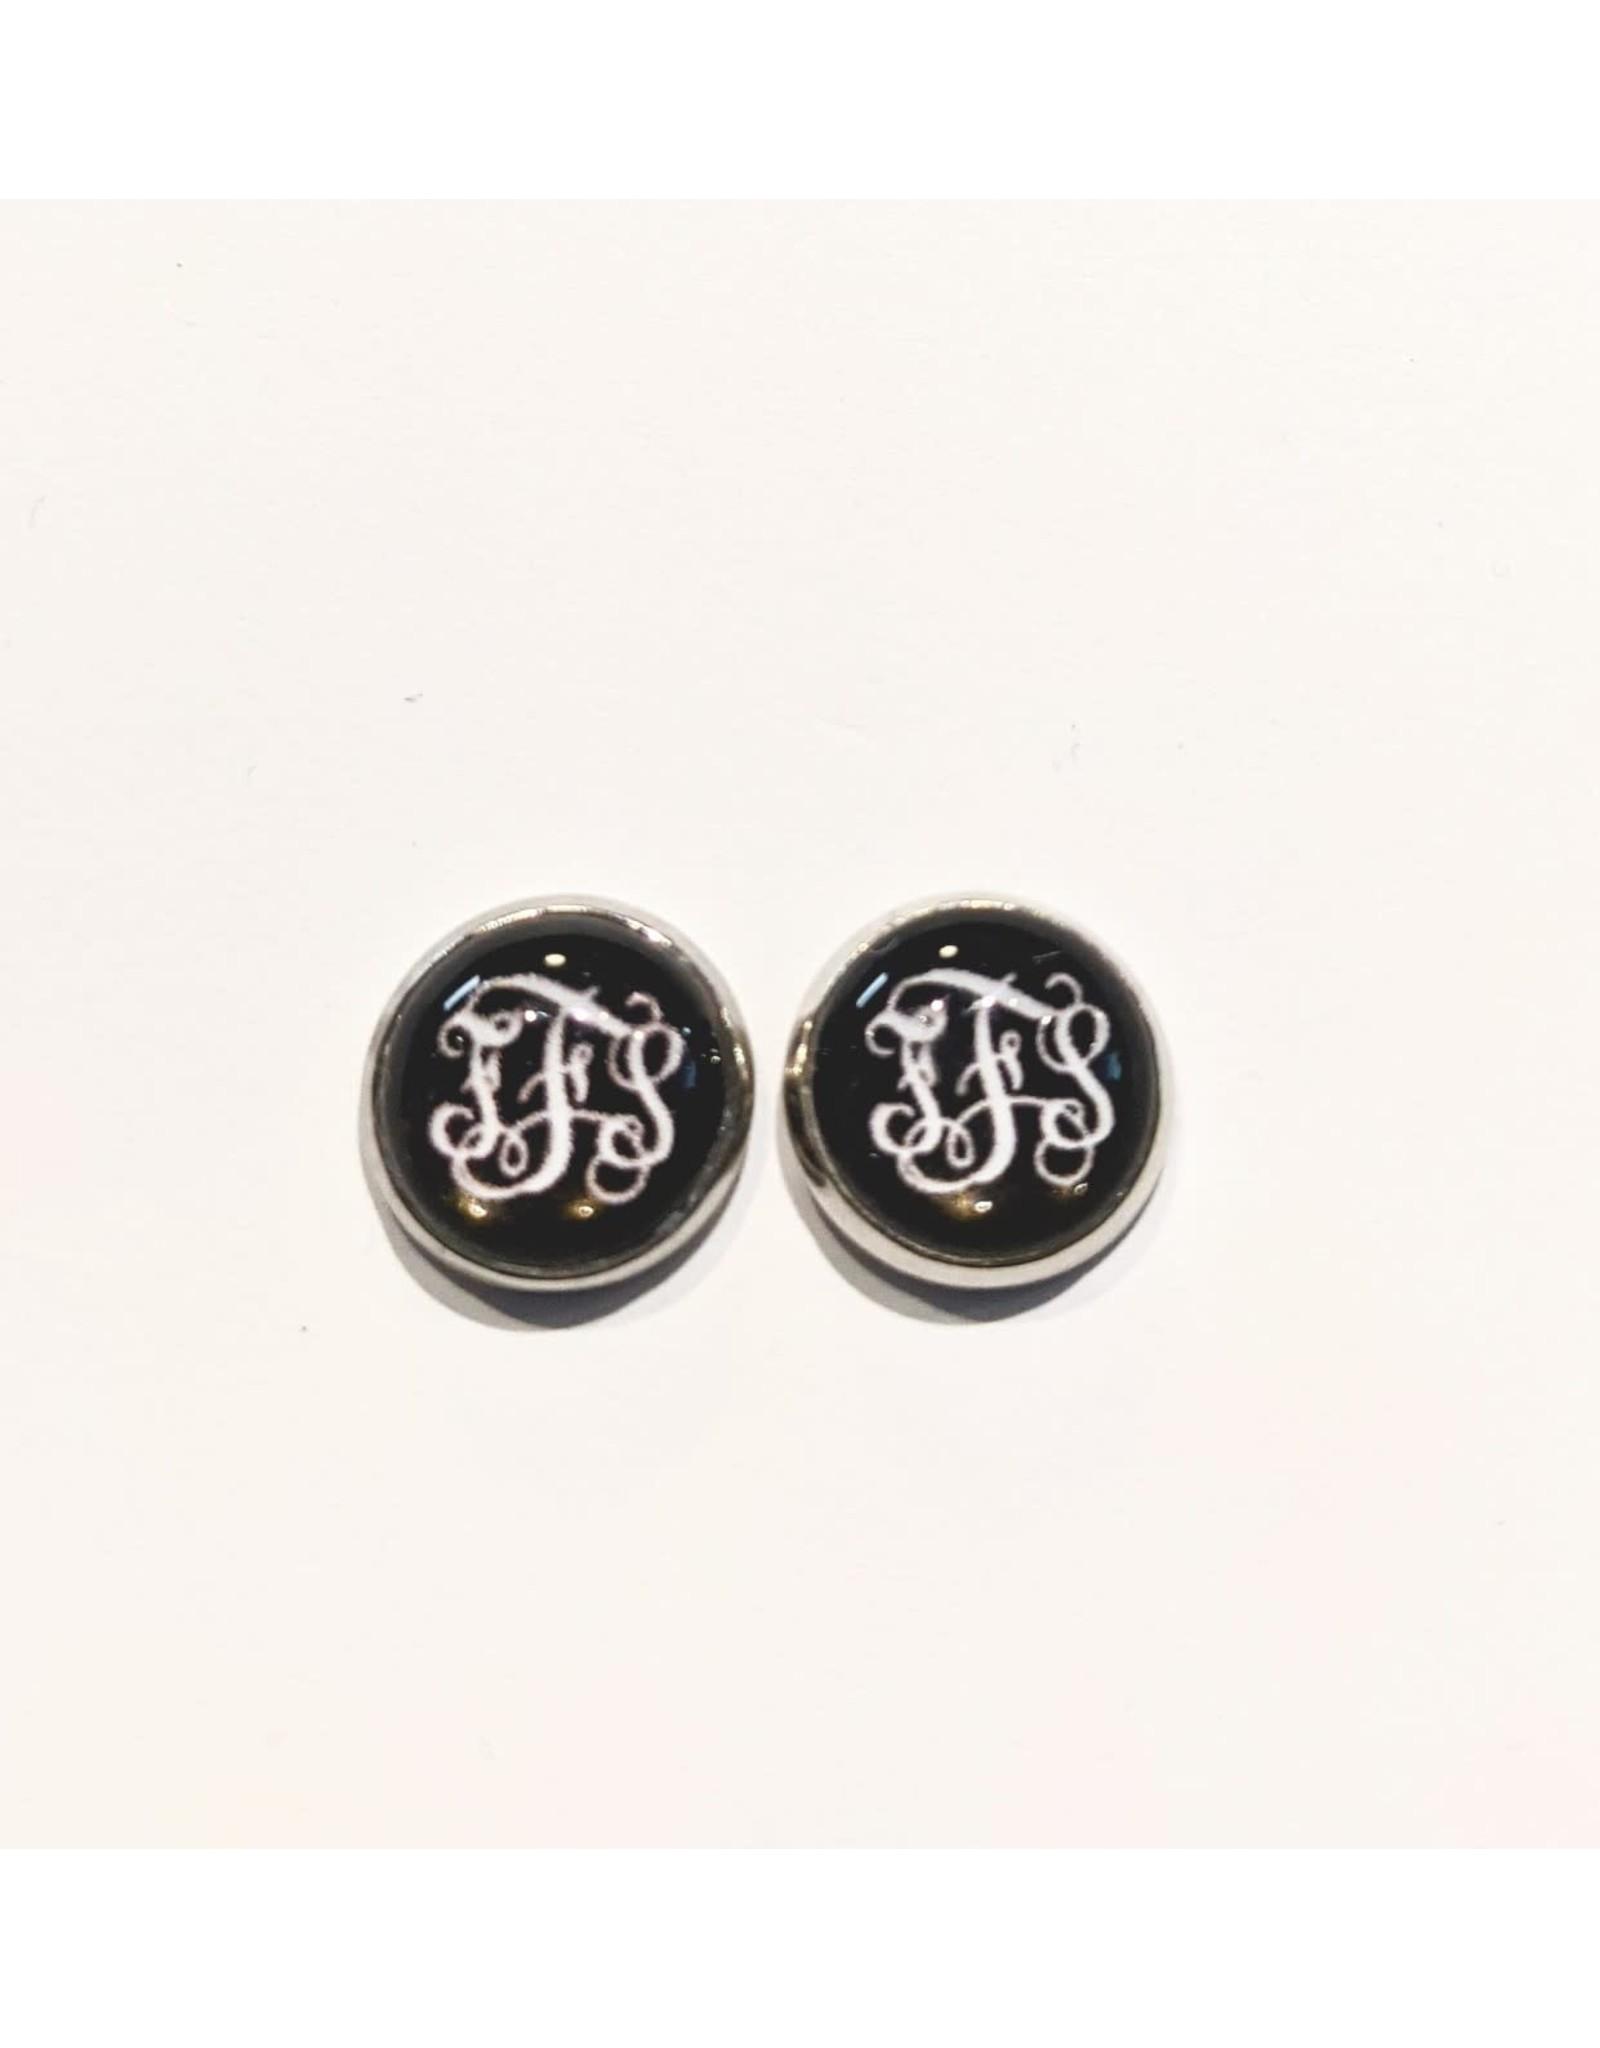 Pish Posh Pendants Earrings - FFS - Black With White Letters